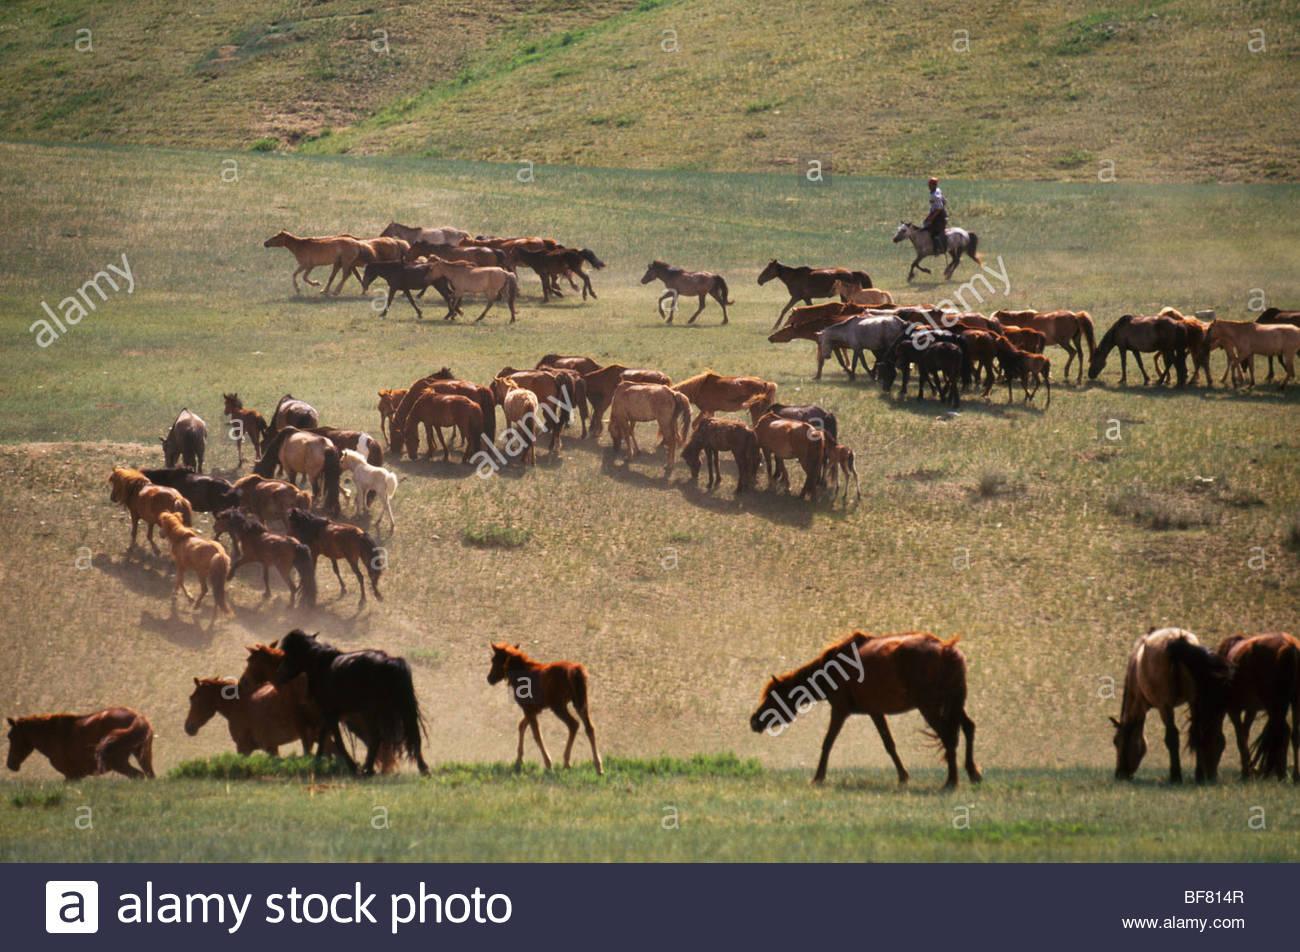 Man herding domestic horses near Hustain Nuruu National Park, Mongolia - Stock Image